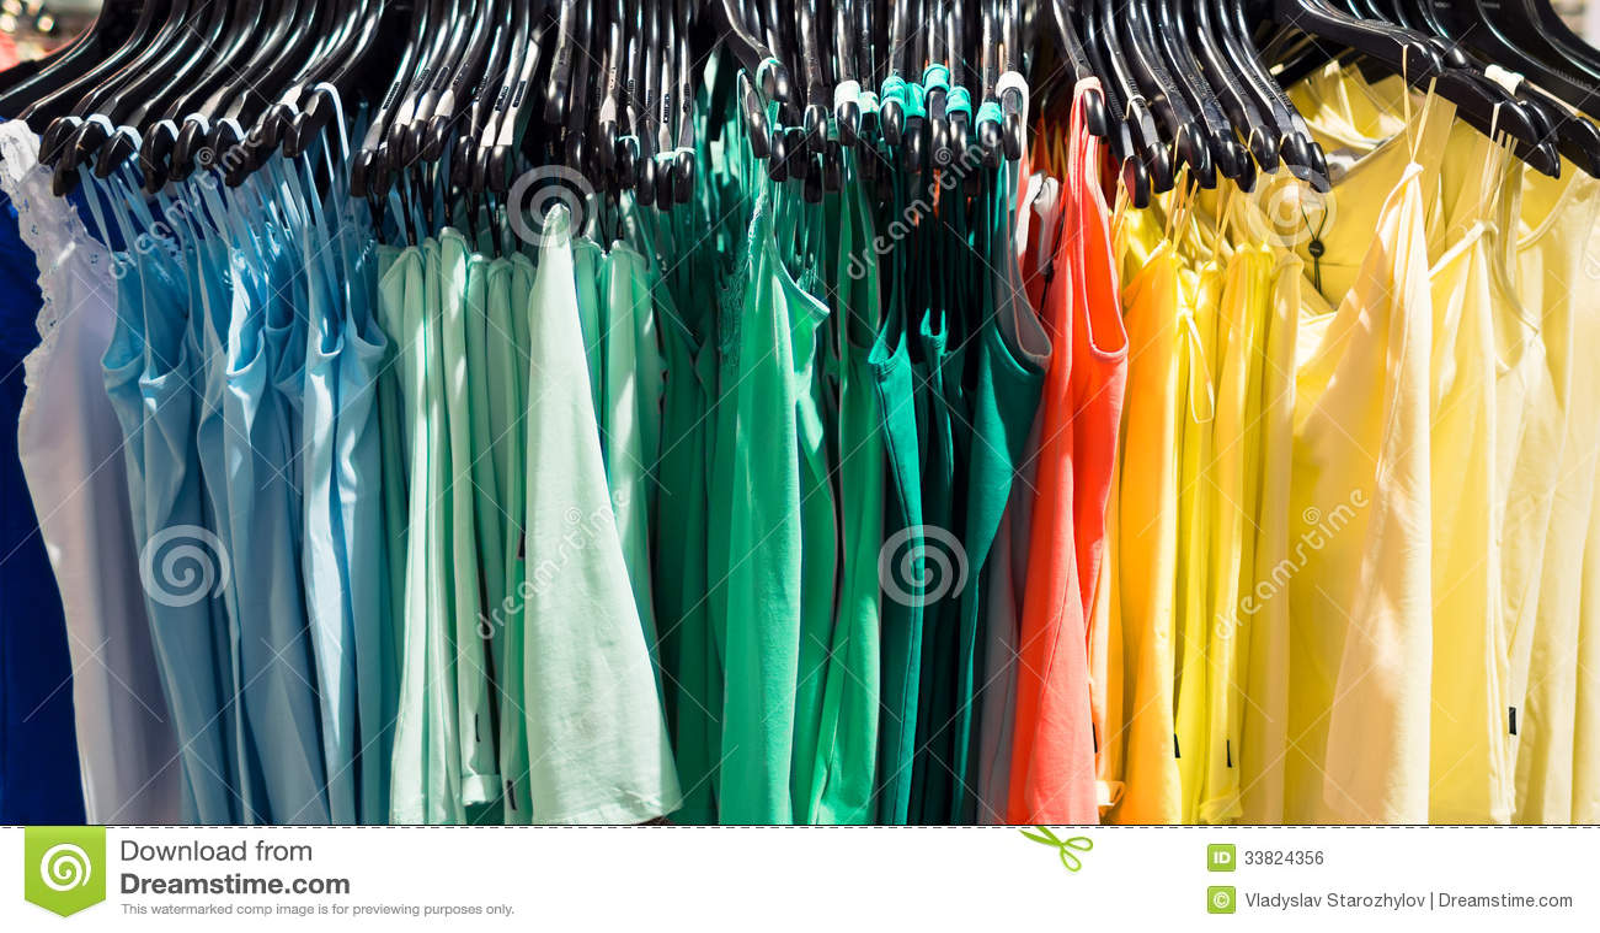 Royalty Free Stock Image: Clothing store